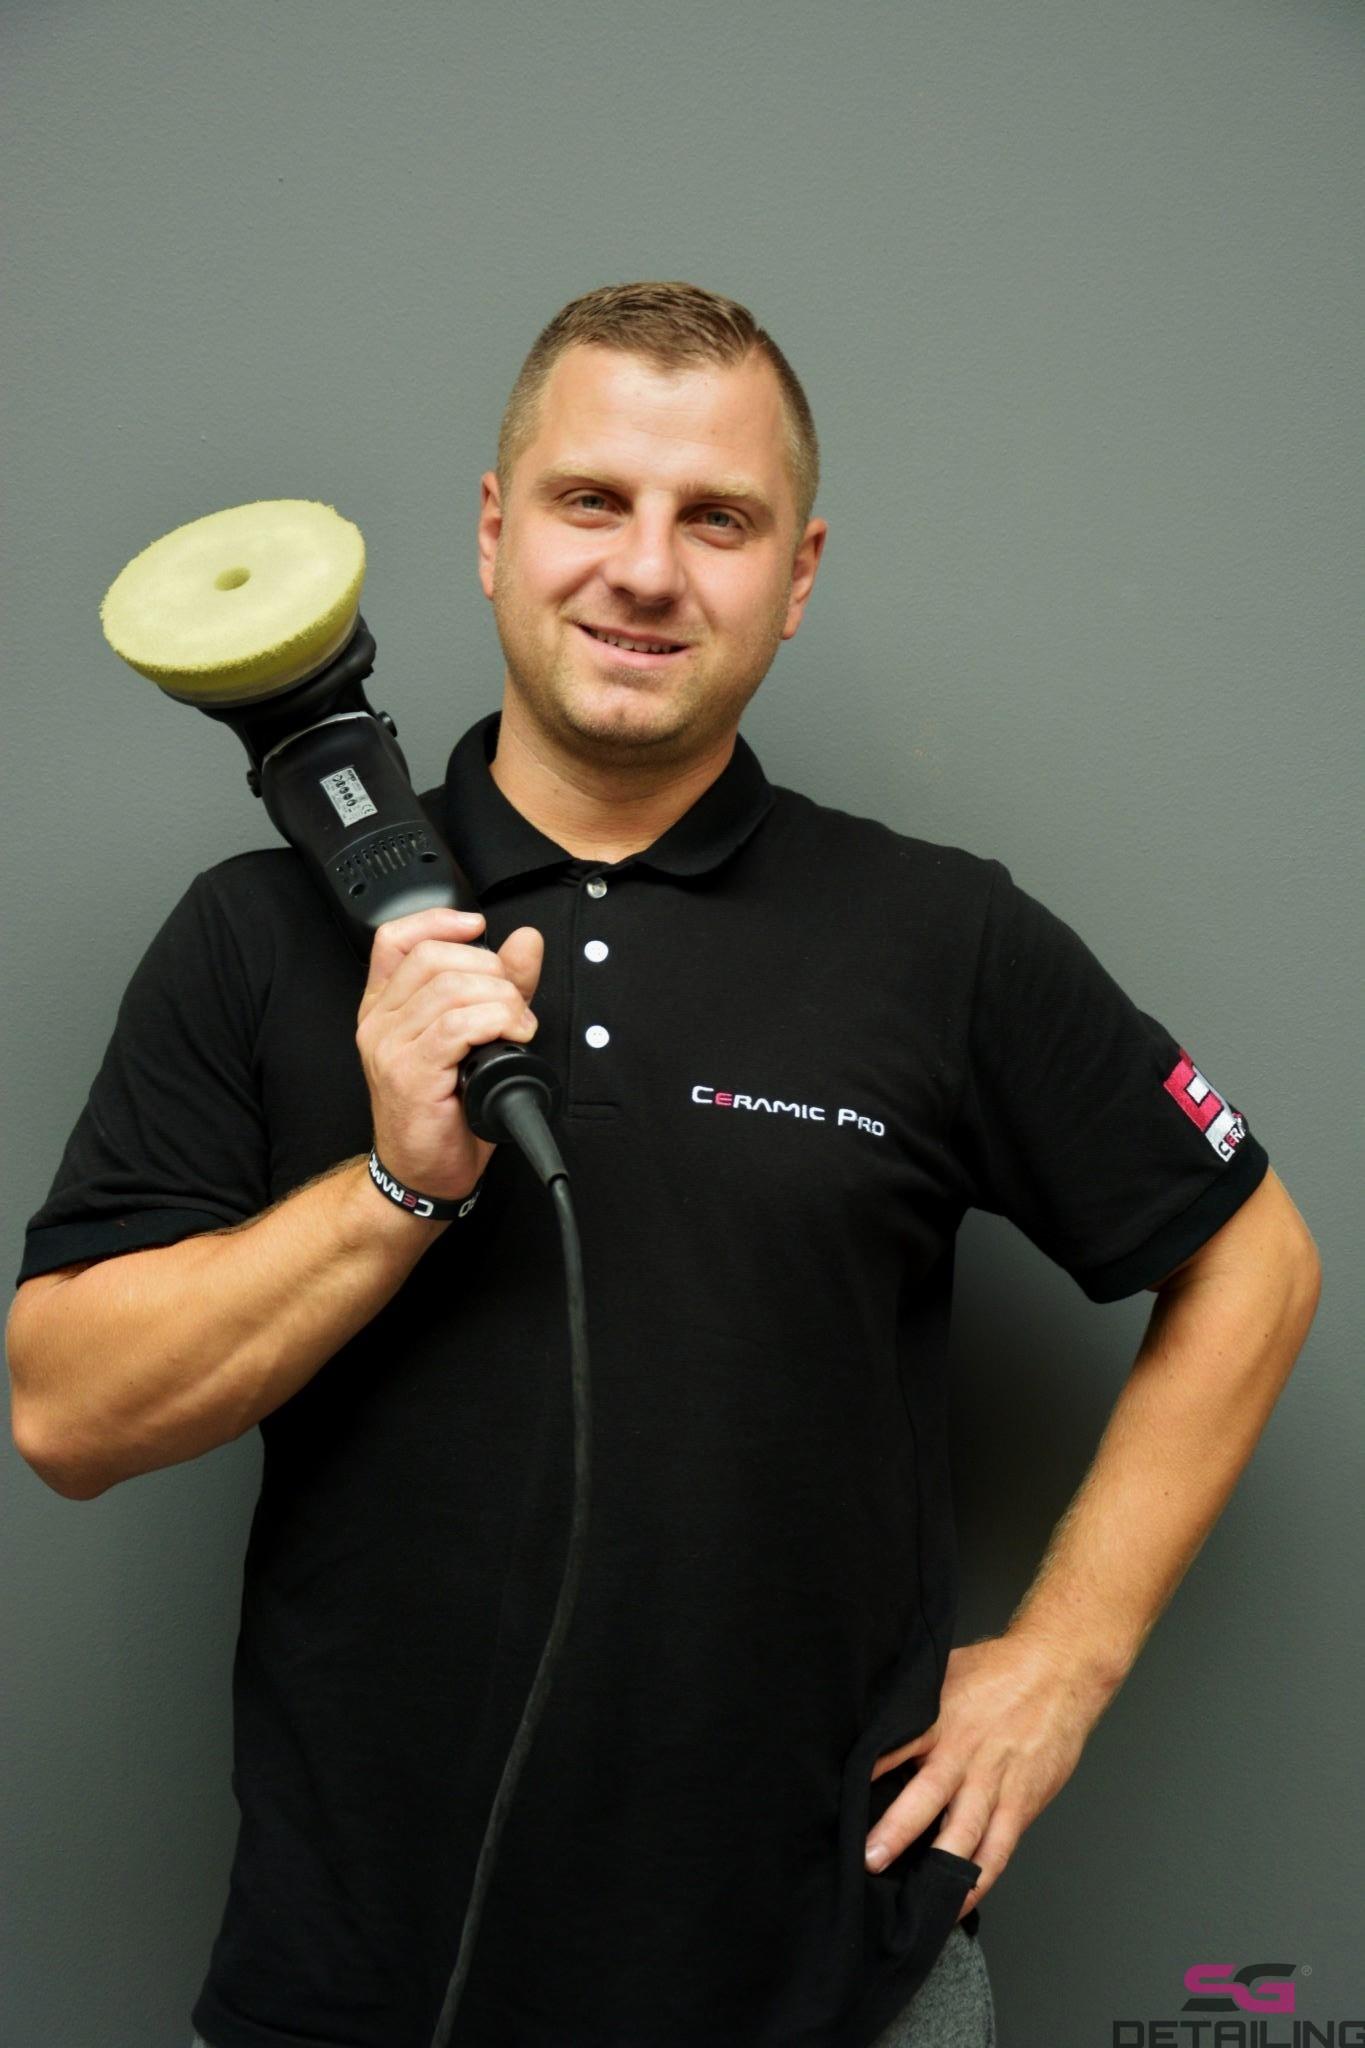 Sebastian Guzierowicz SG Detailing